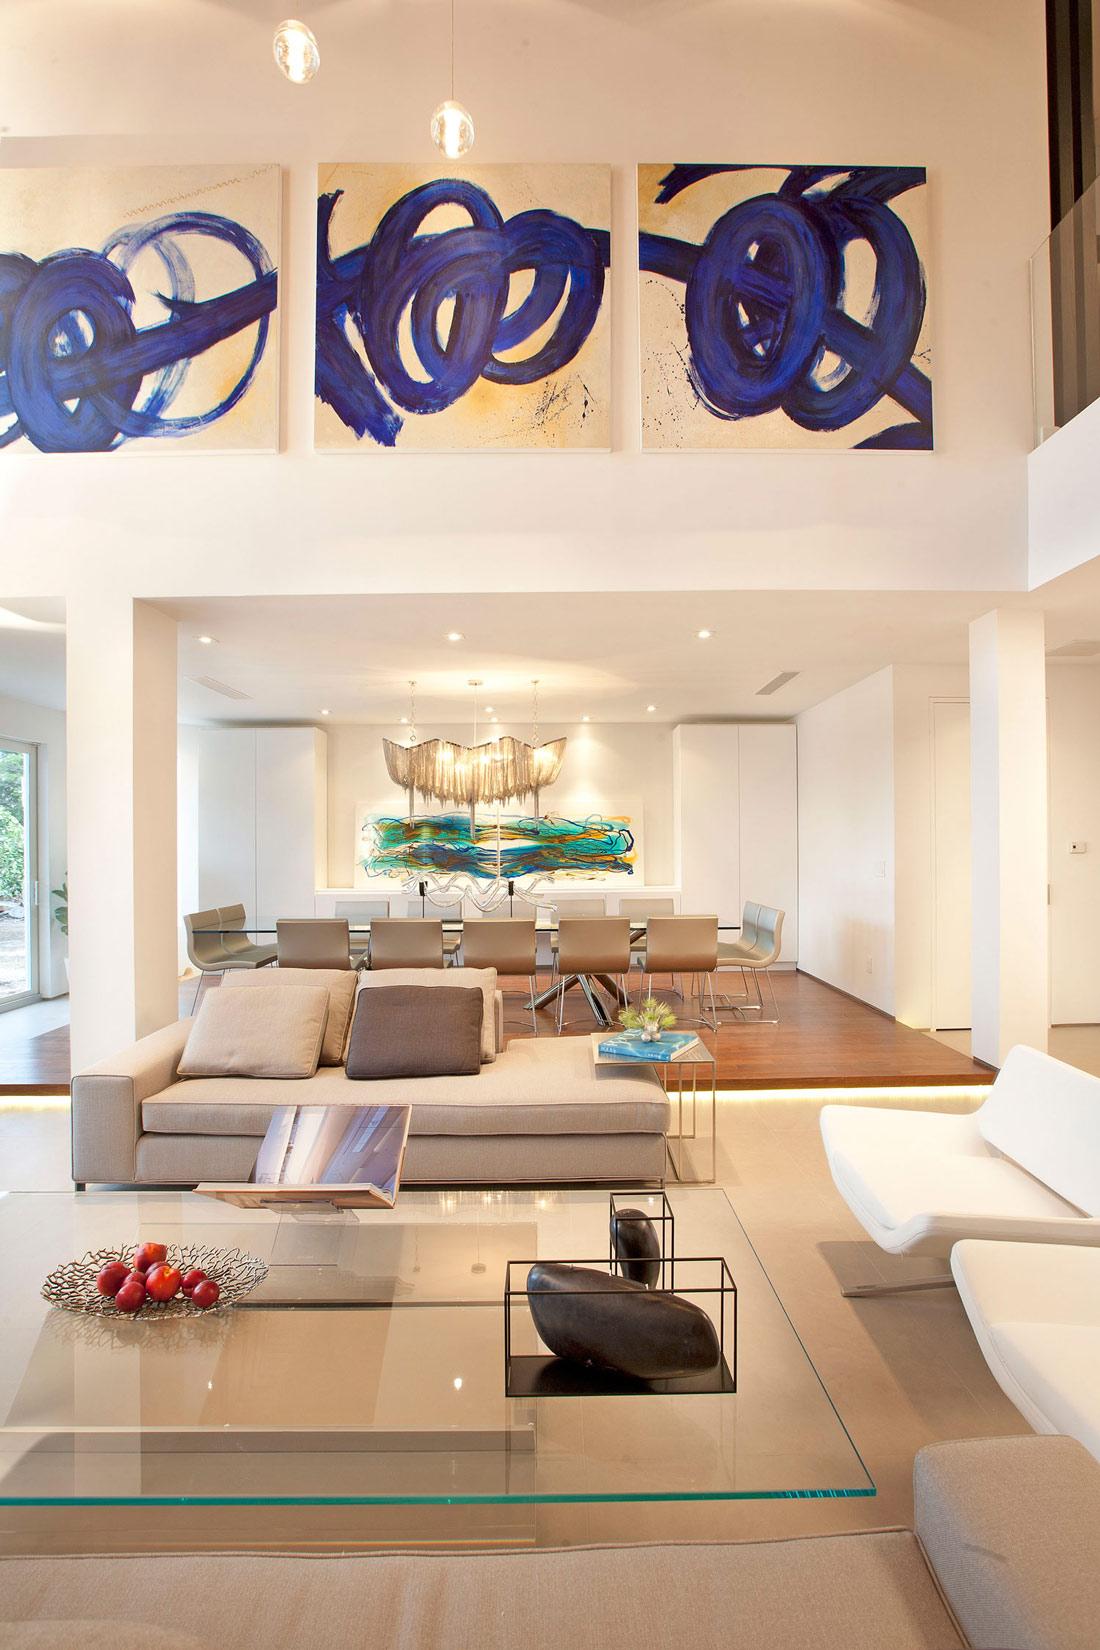 Sofa, Coffee Table, Living Space, Stylish Interior Design in Miami, Florida